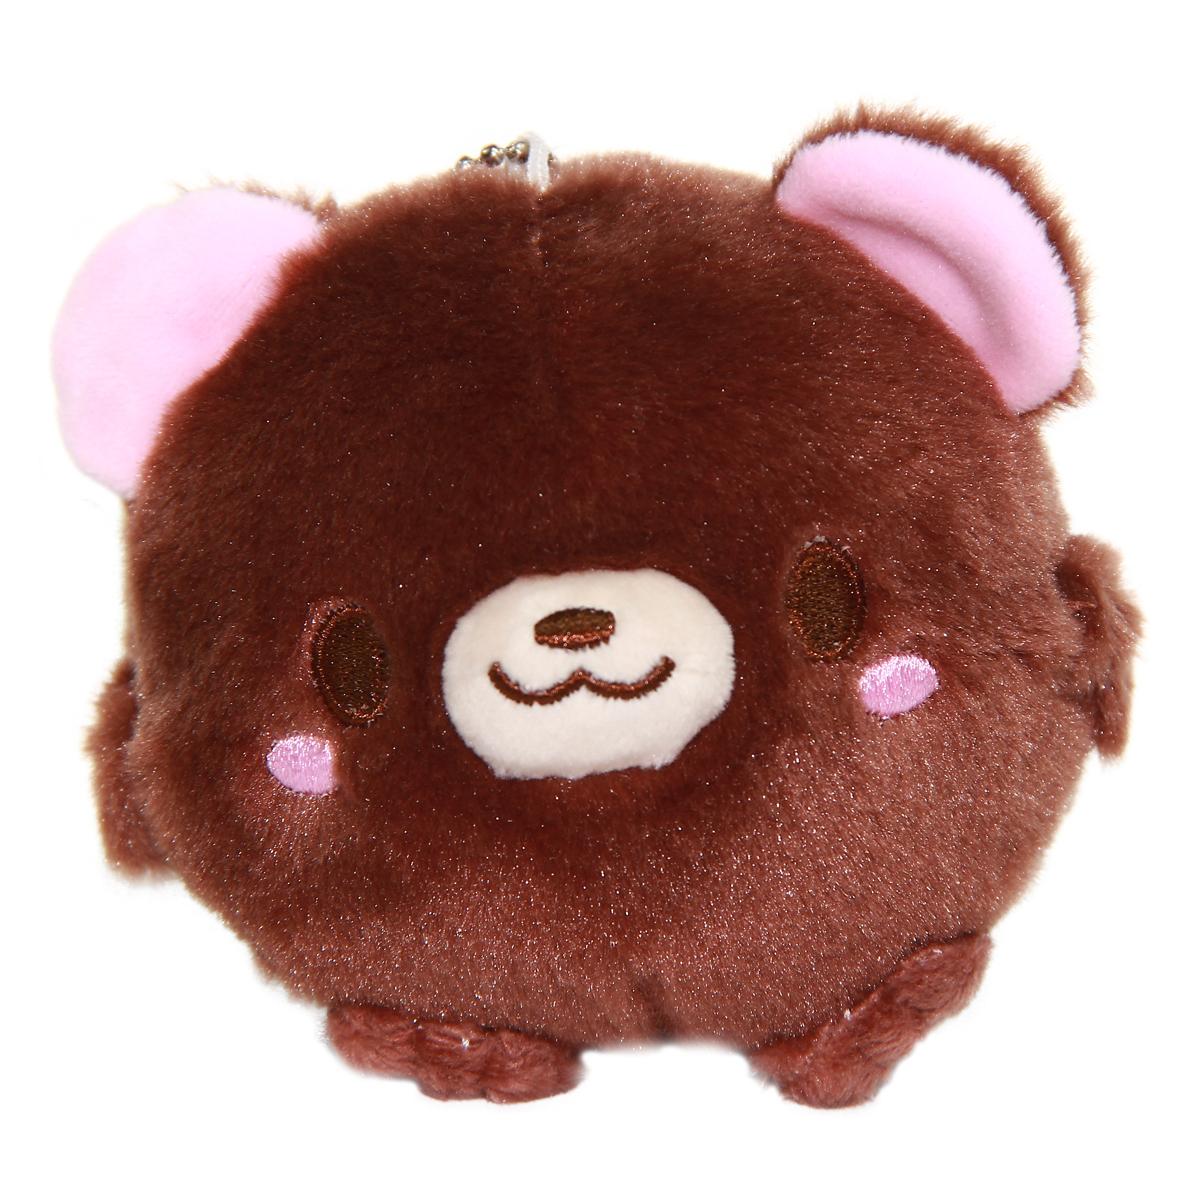 Bear Plush Doll Kawaii Stuffed Animal Soft Fuzzy Squishy Plushie Mochi Brown